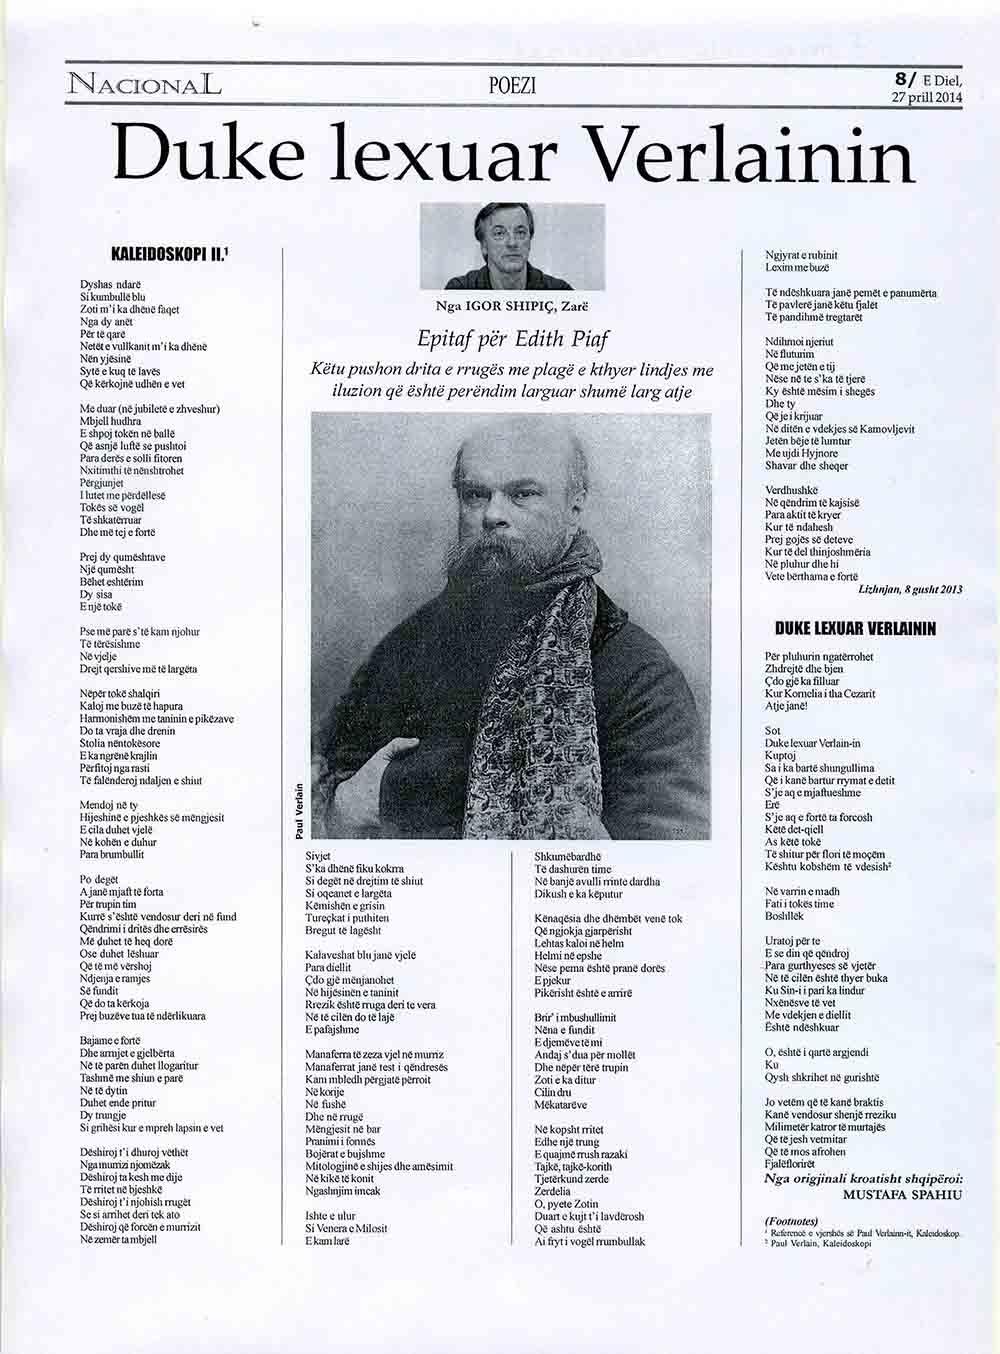 Pablo Bilosnic 2